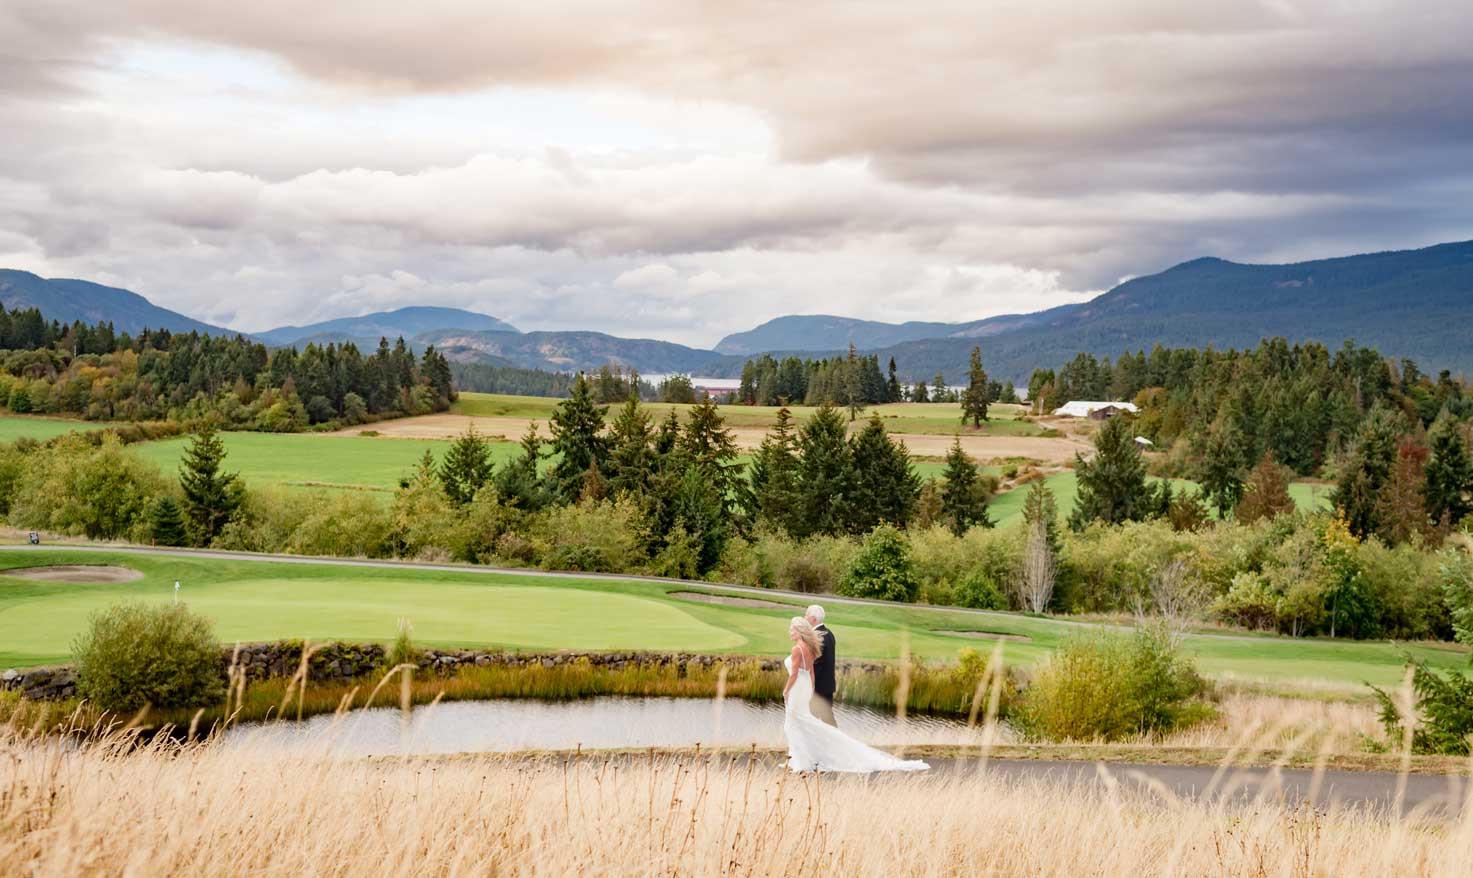 Walk through beautiful fields